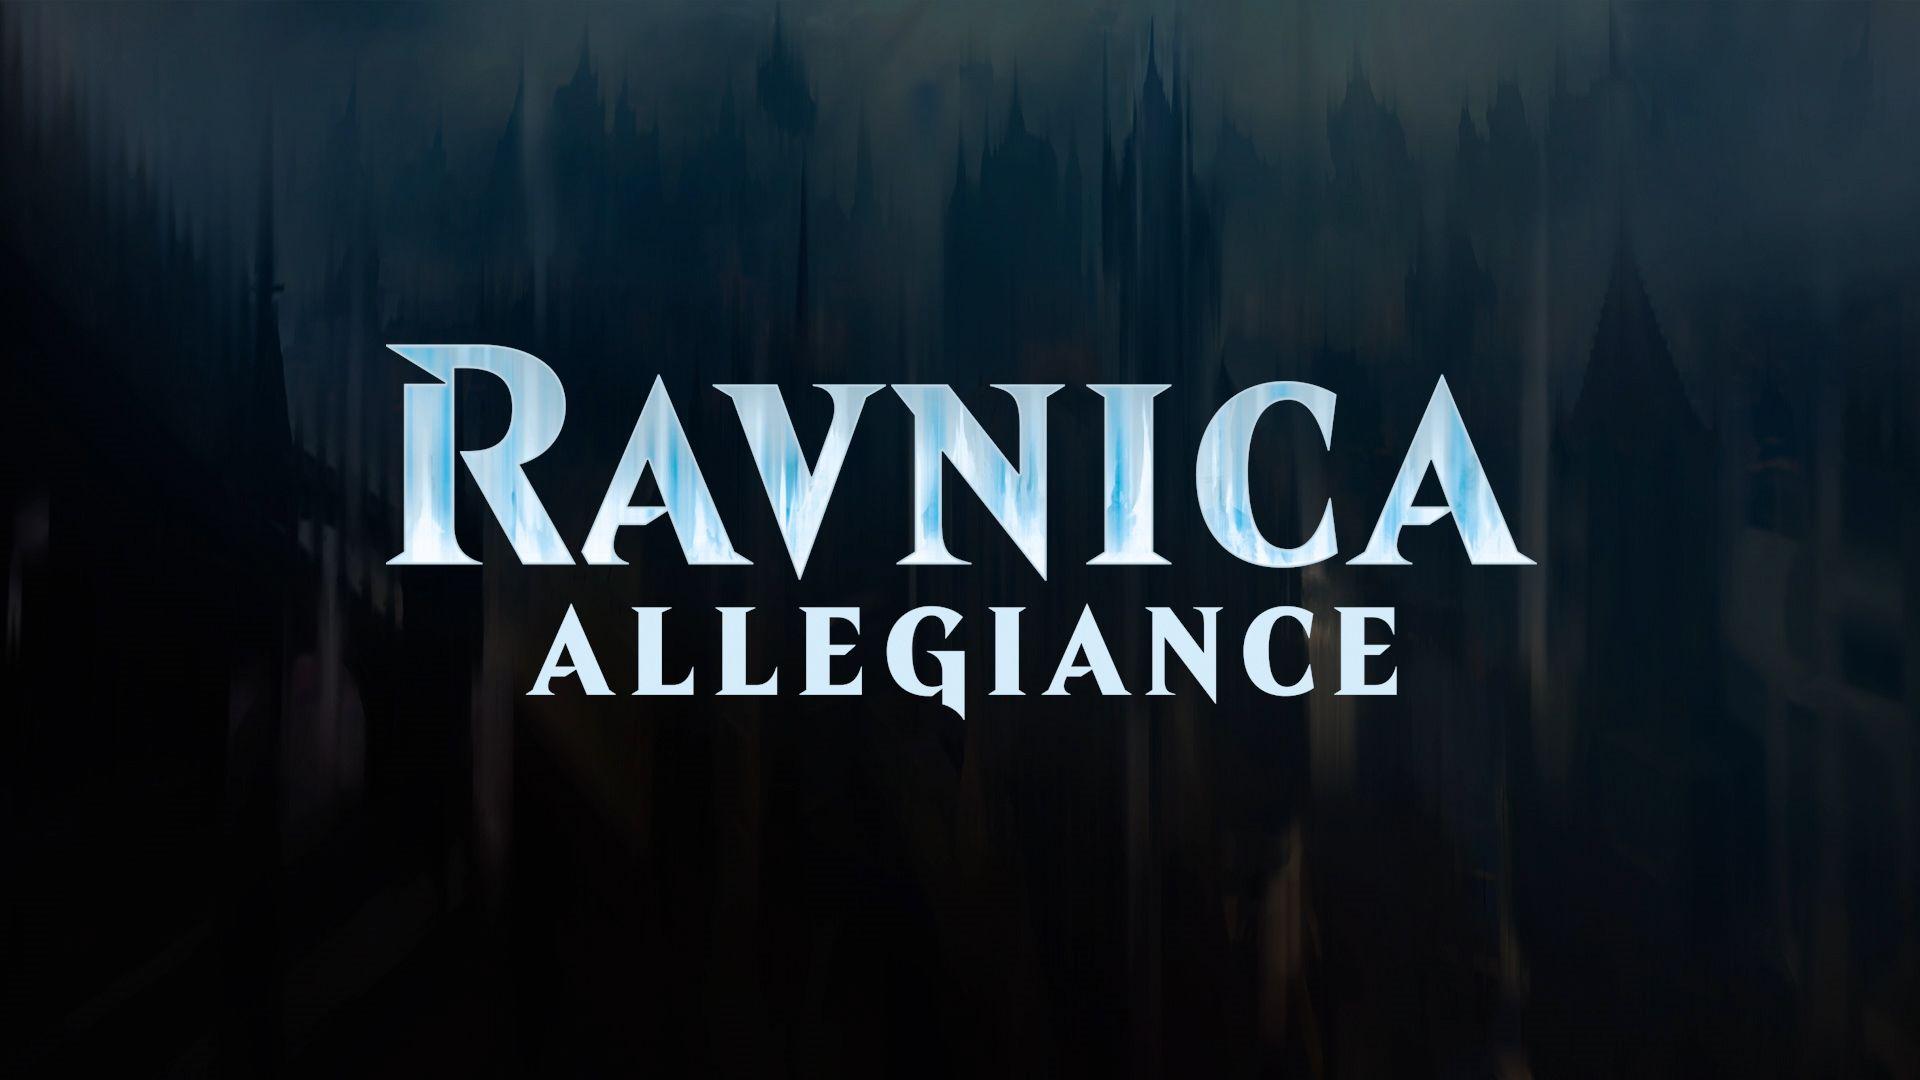 Ravnica Allegiance Logo